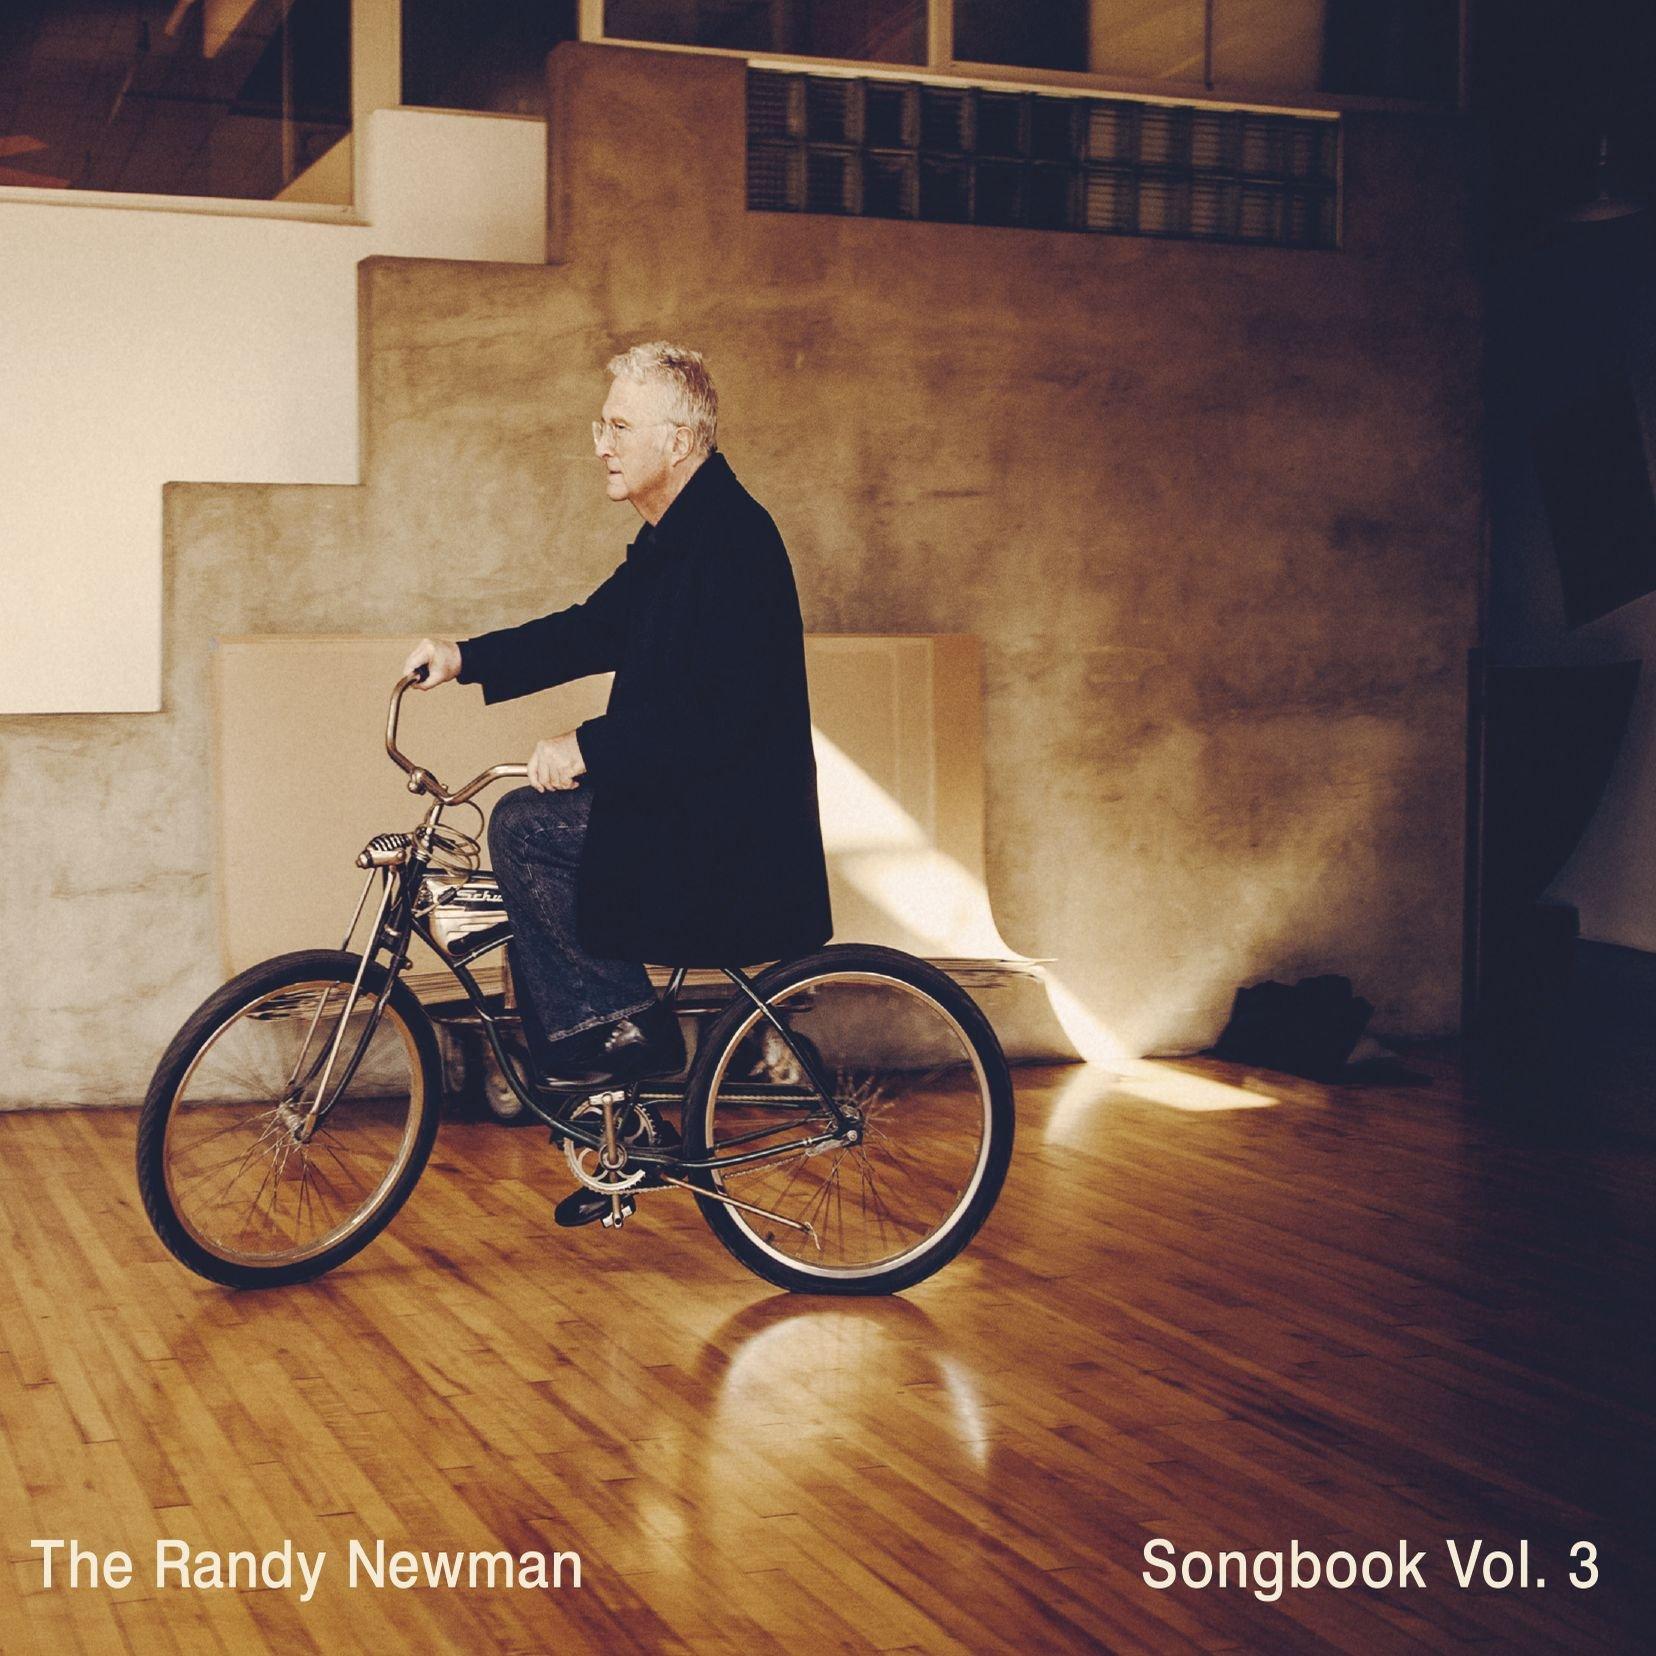 Randy Newman - The Randy Newman Songbook. Vol. 3